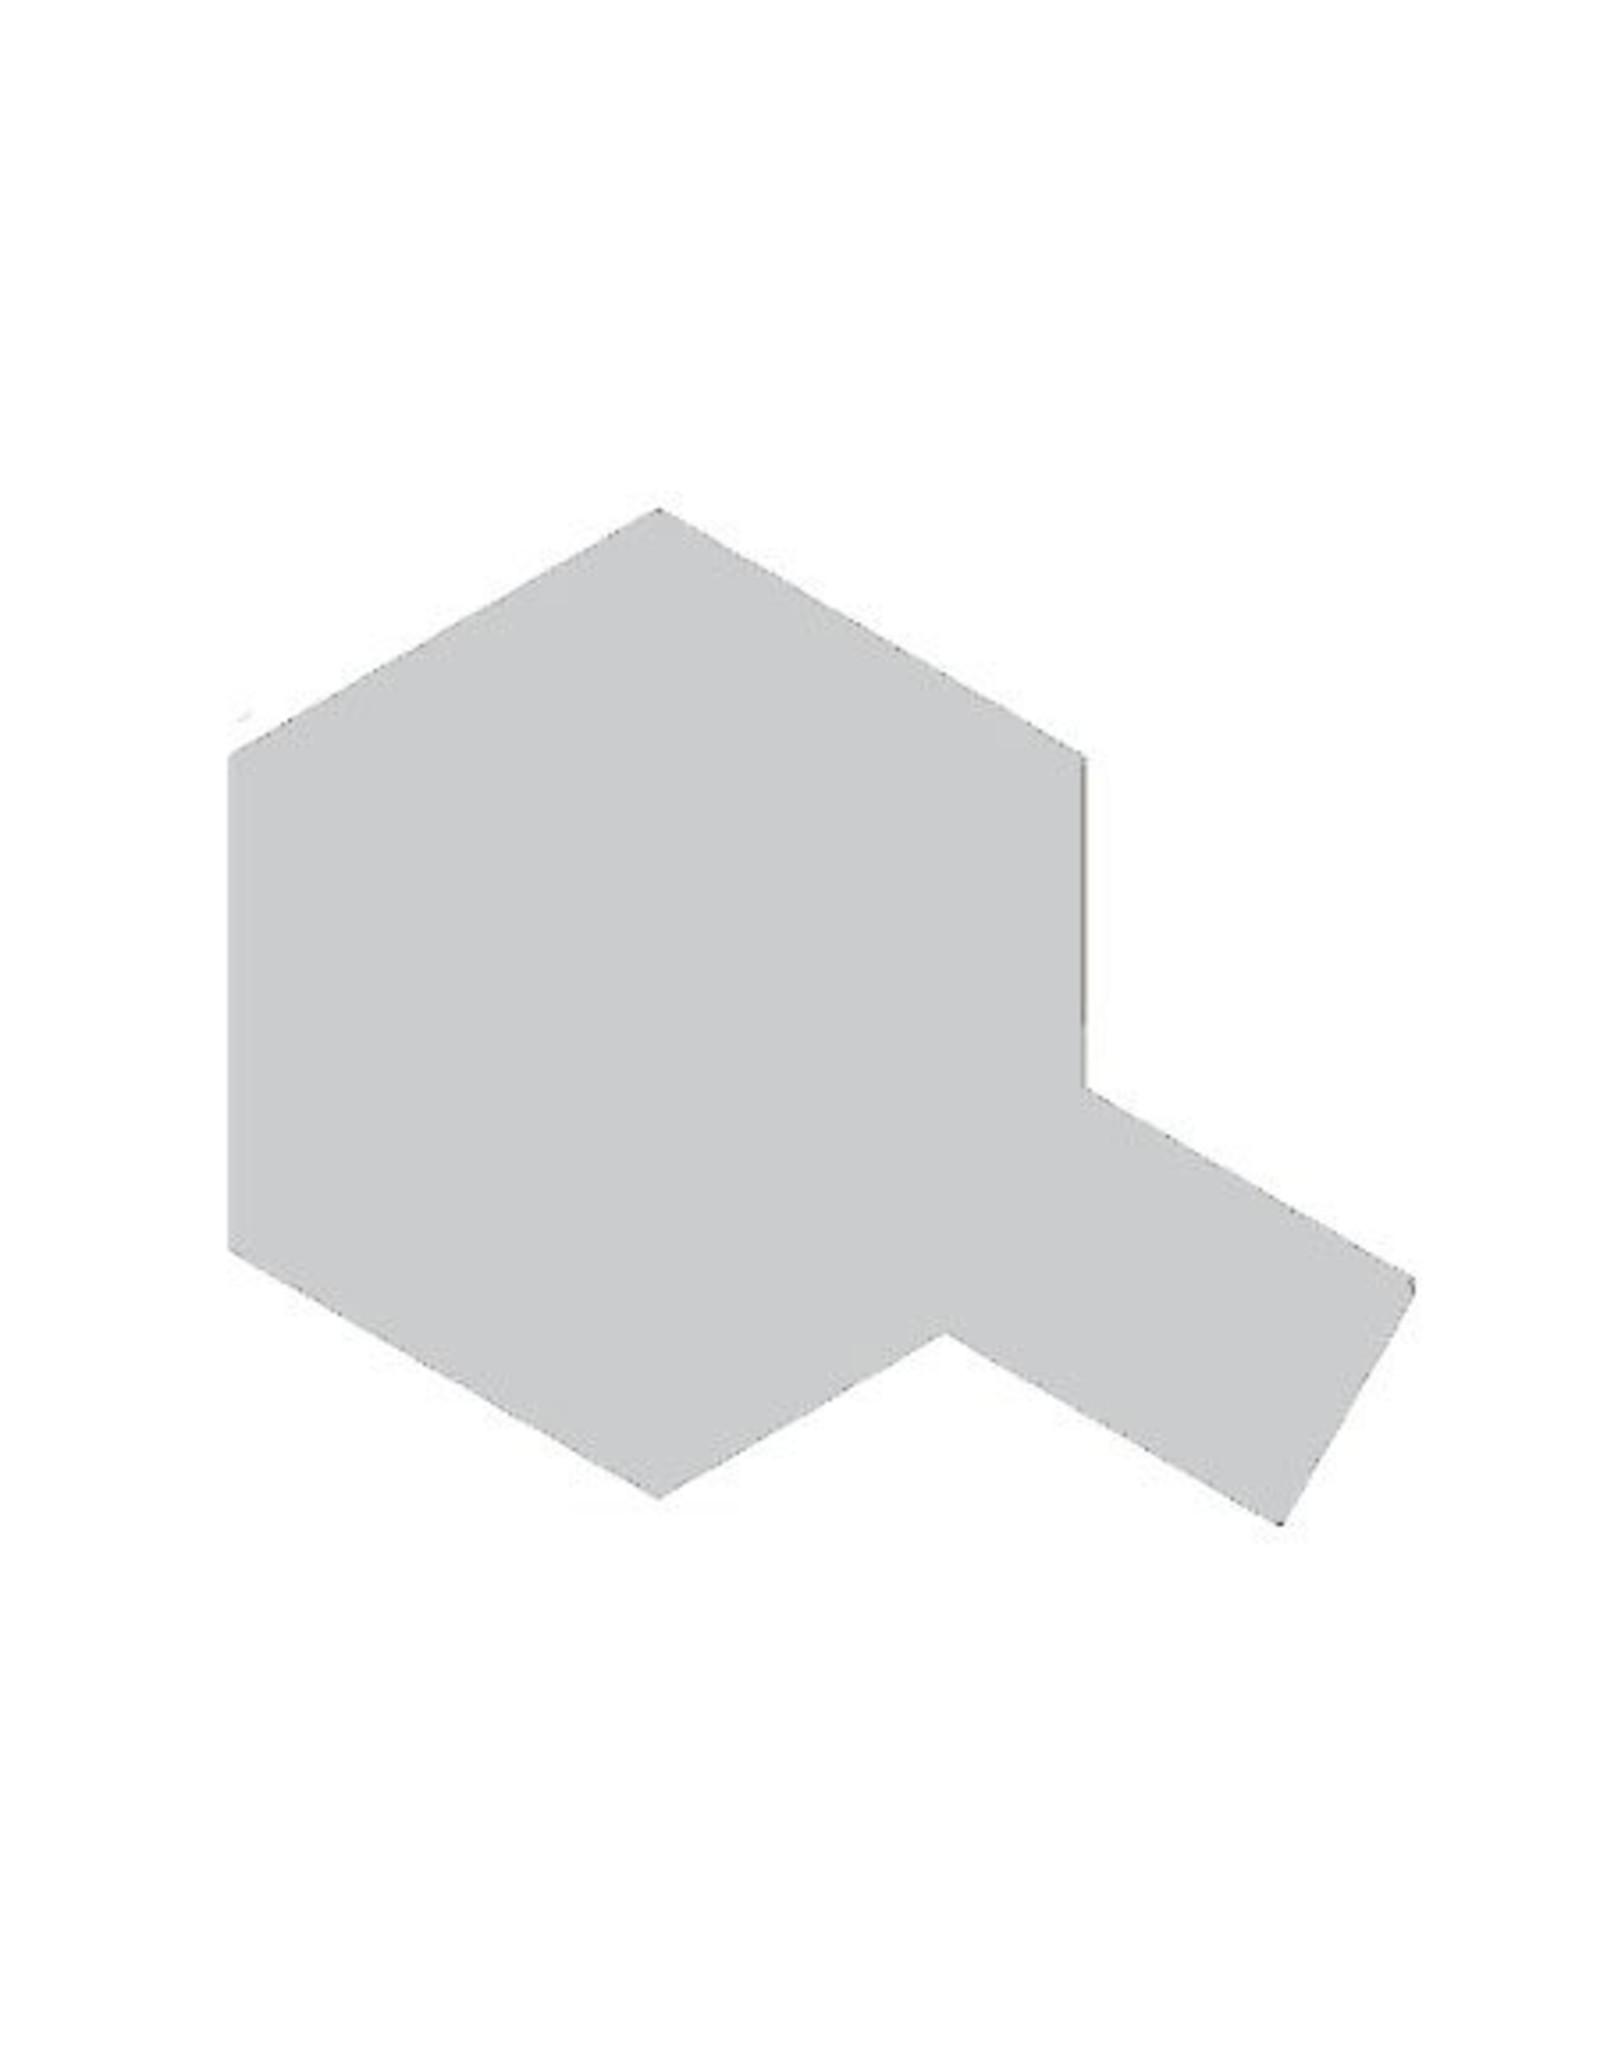 Tamiya Acrylic Mini X-11 Chrome Silver